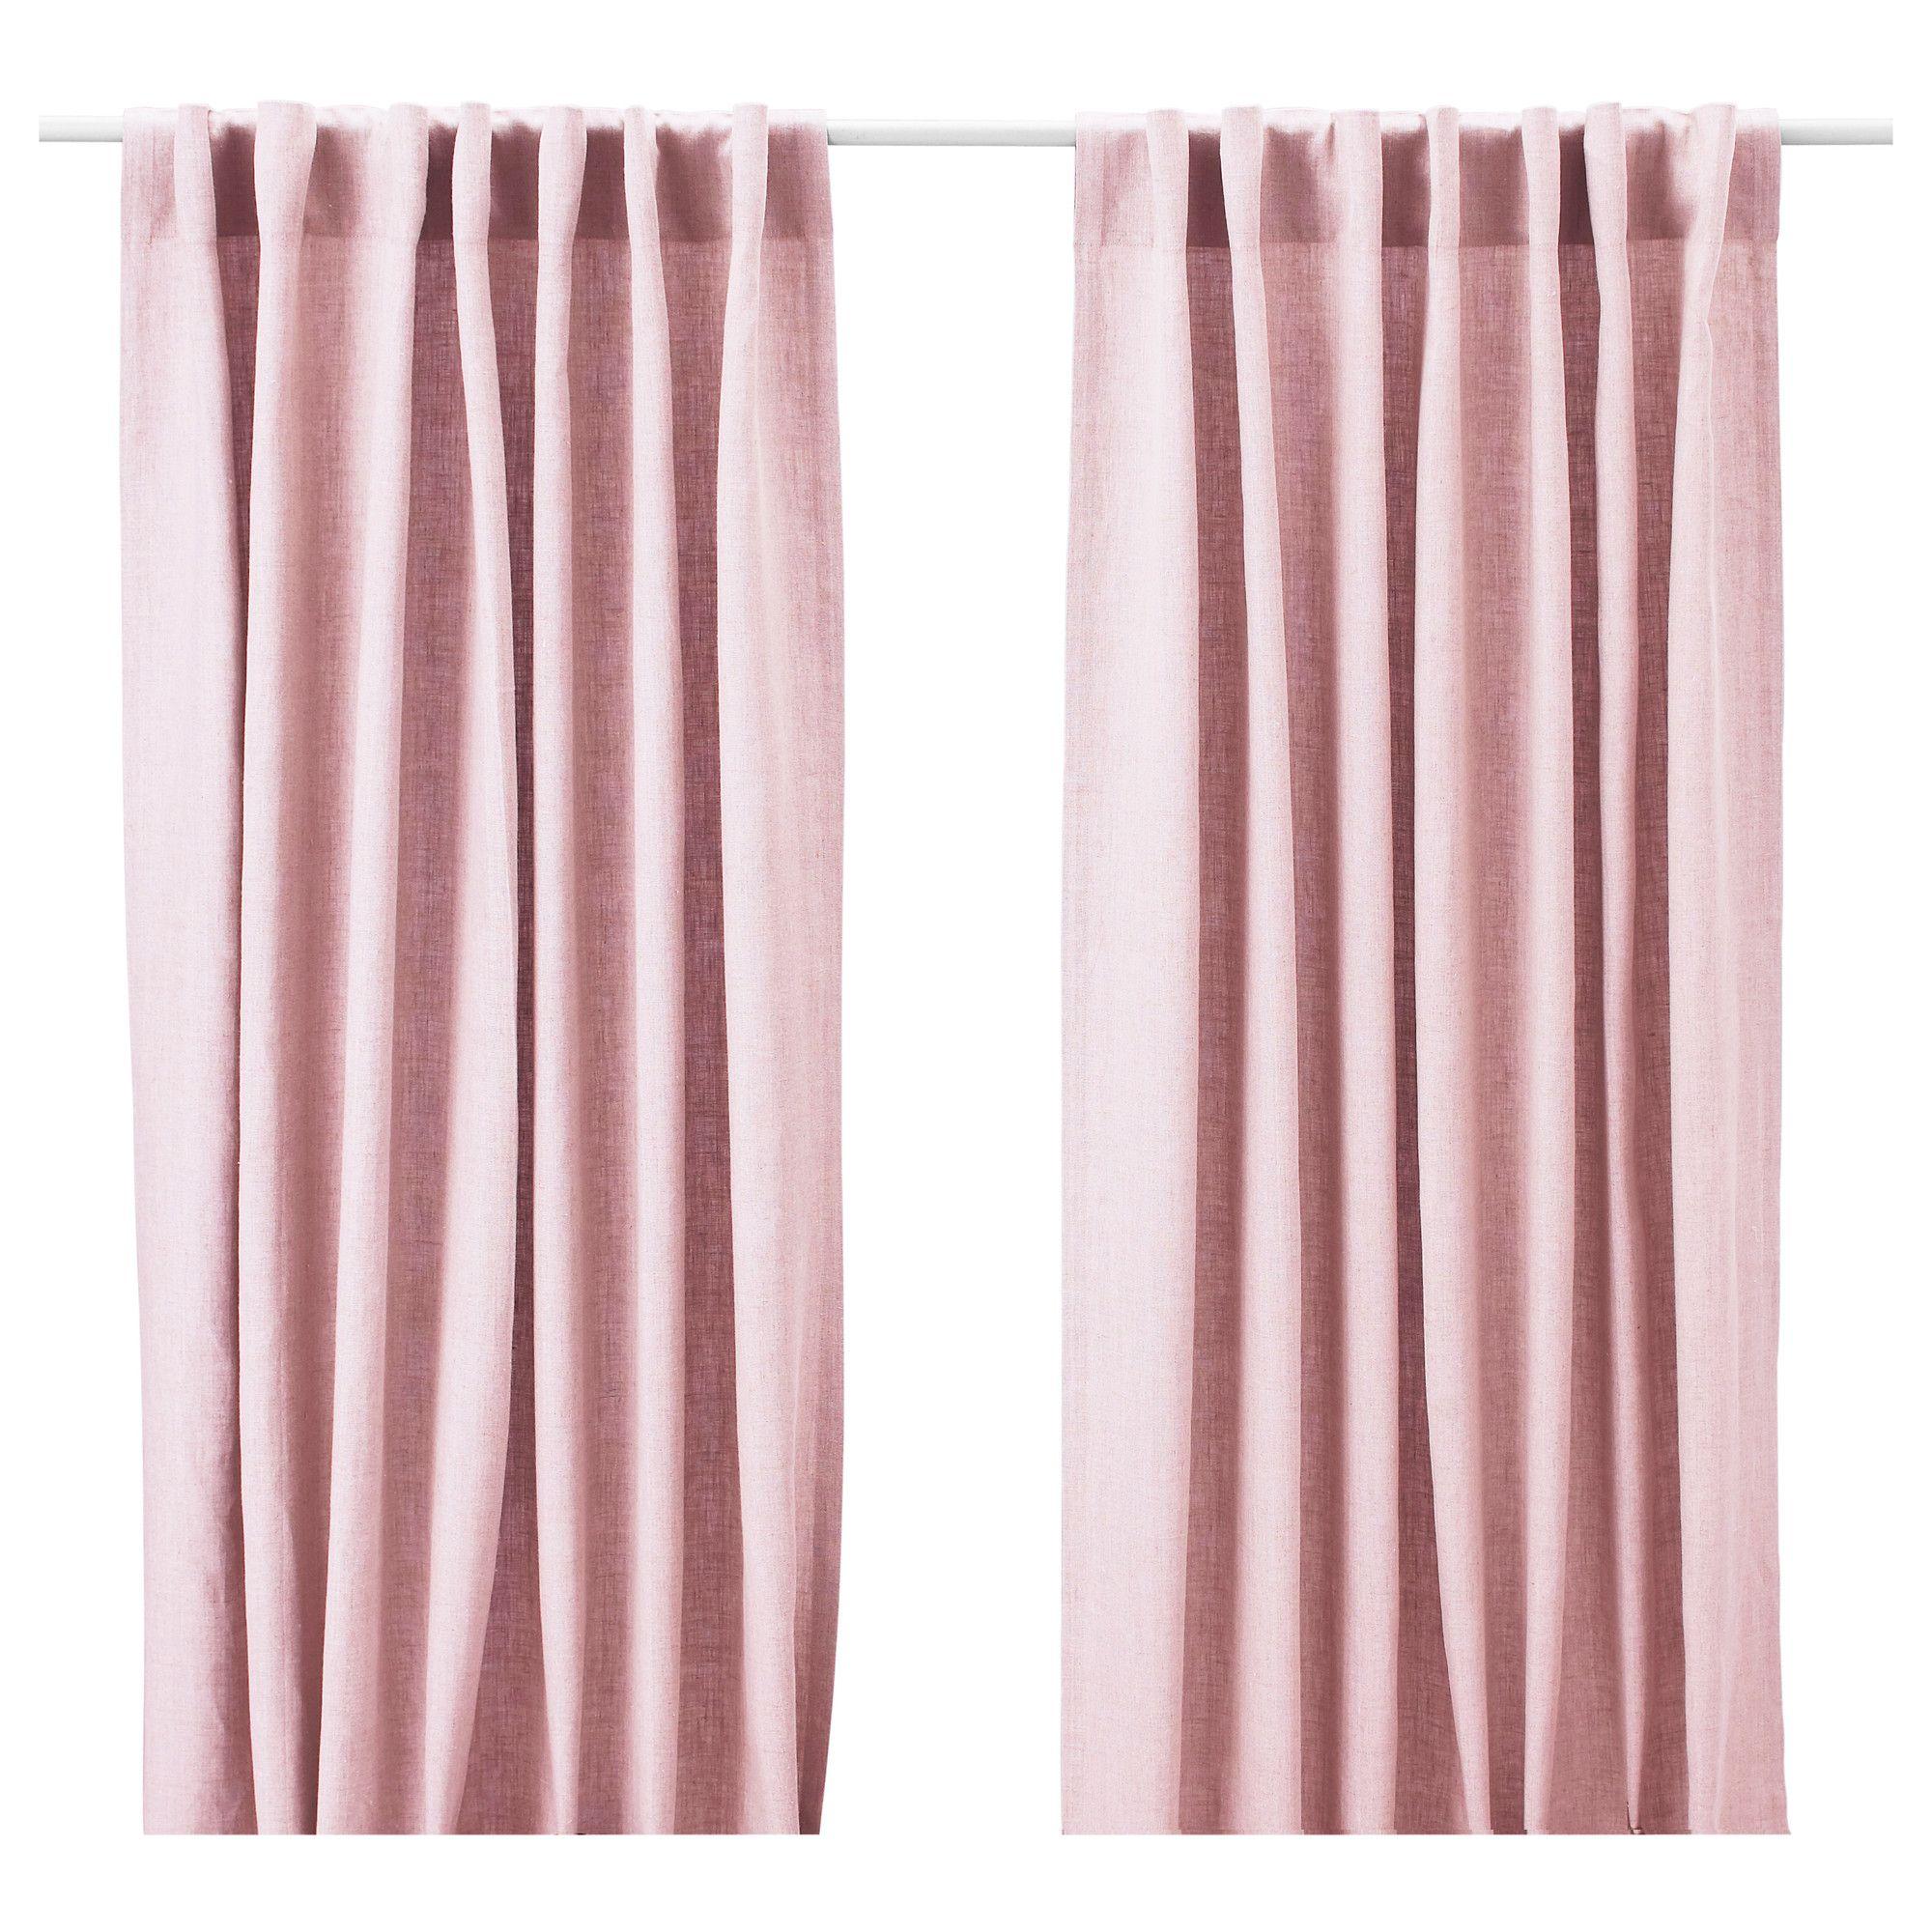 Aina cortina 1par ikea deco cortinas pinterest - Cortinas exterior ikea ...